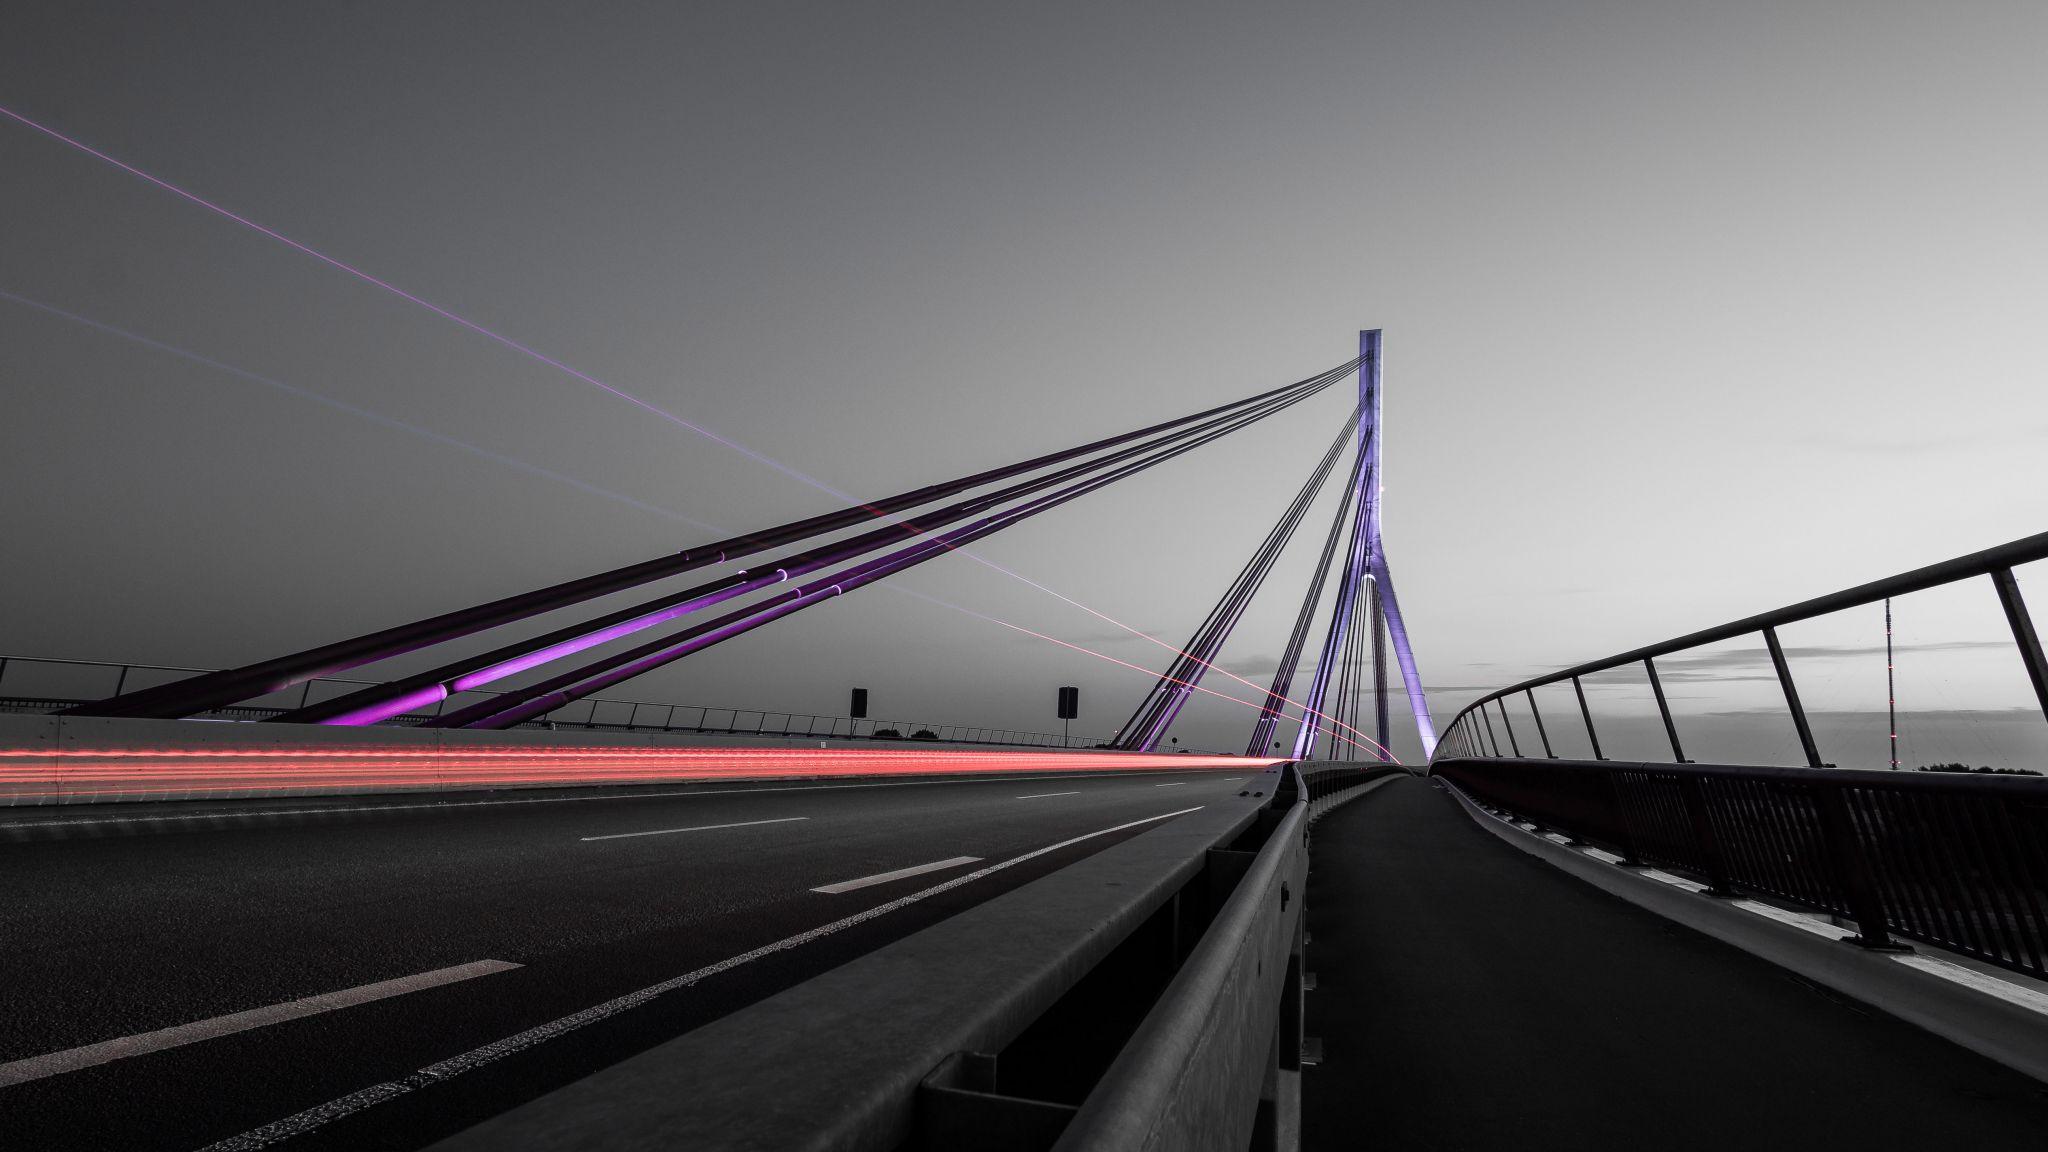 Rheinbrücke Wesel, Germany